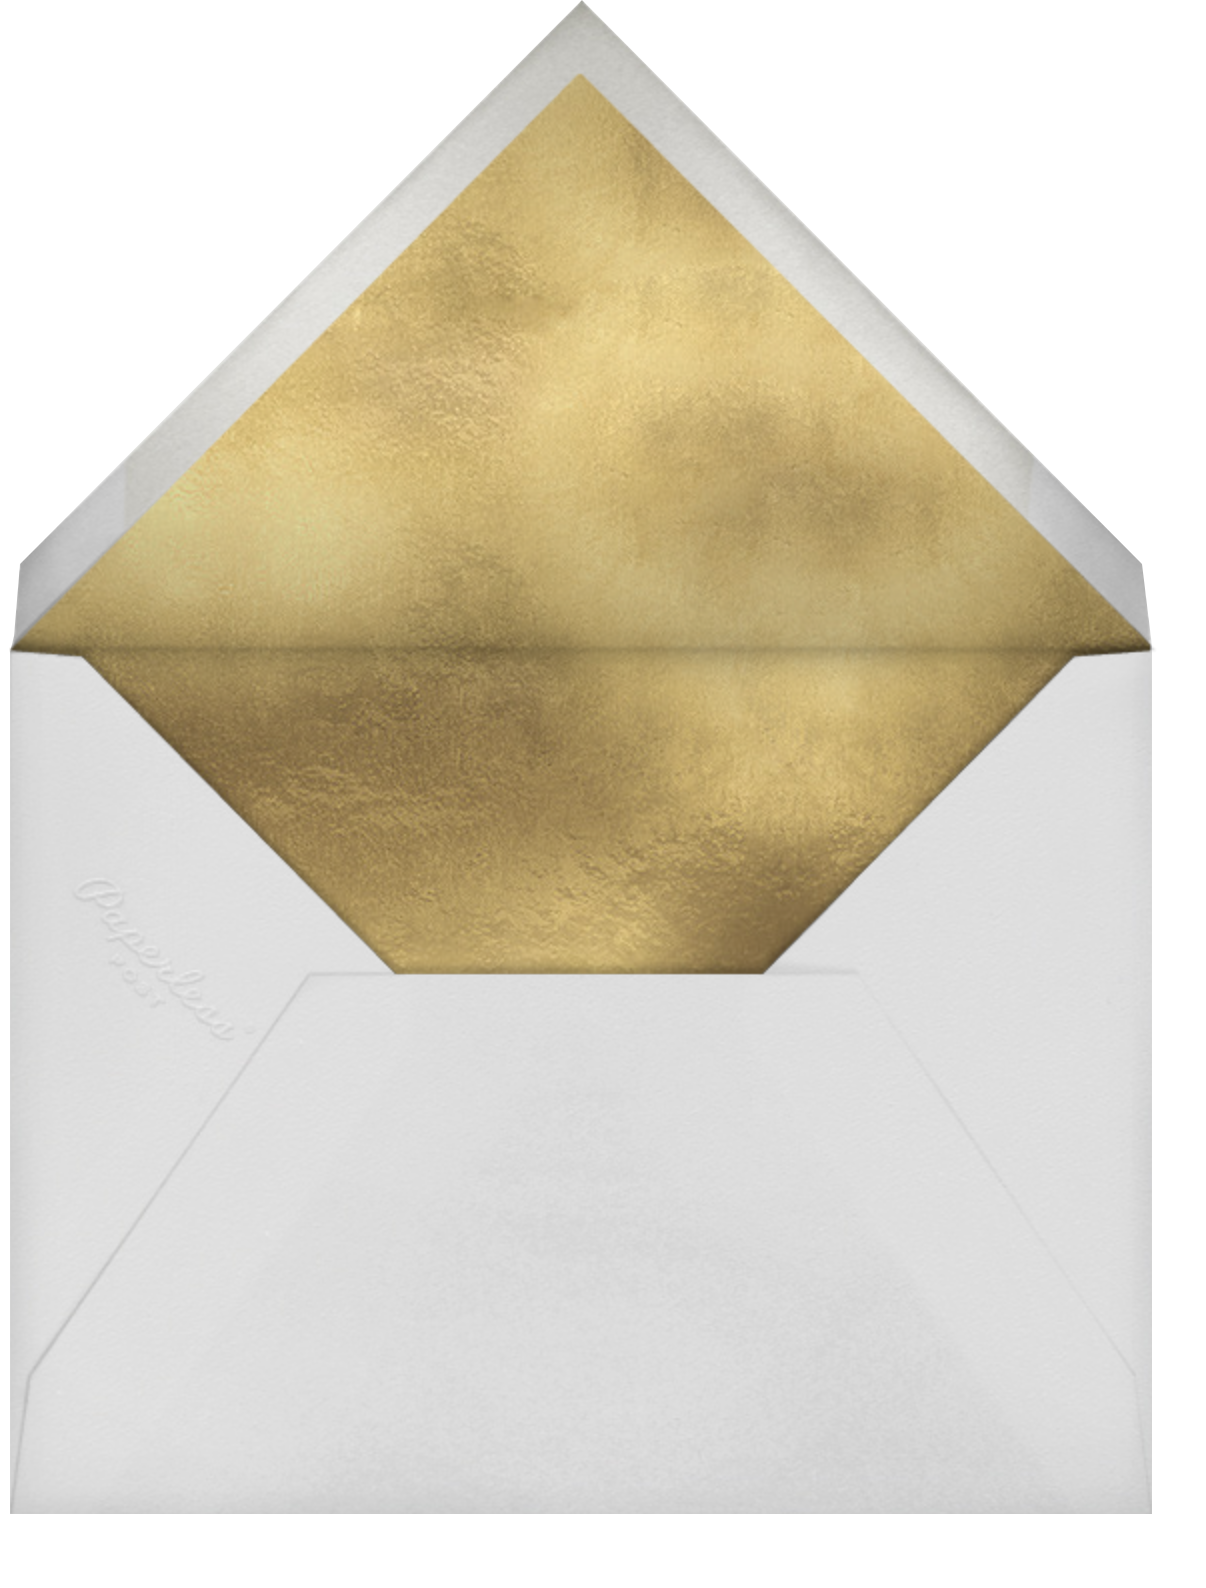 Penrose - Jonathan Adler - Bar and bat mitzvah - envelope back